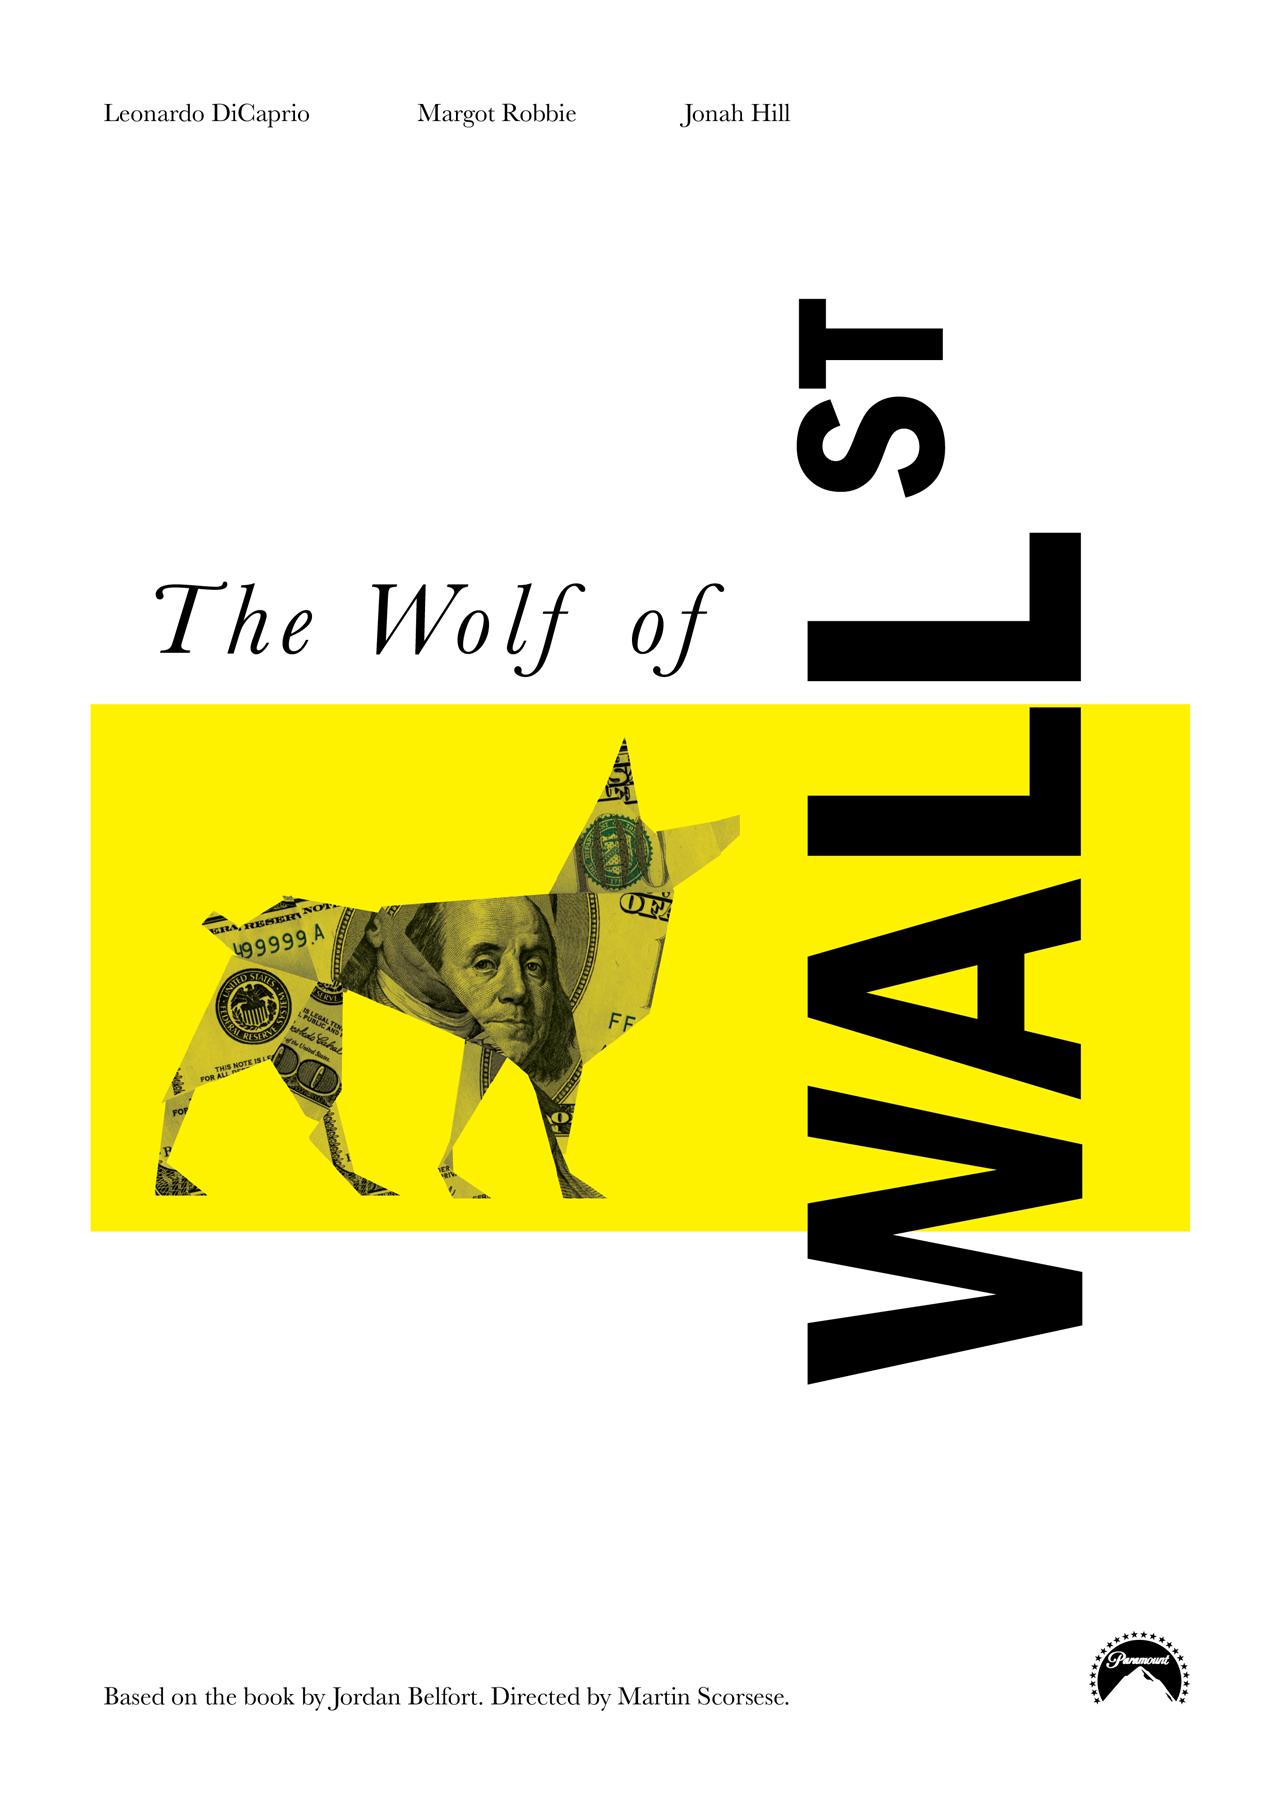 the wolf of wall street movie posters minimalist on wall street movie id=33263